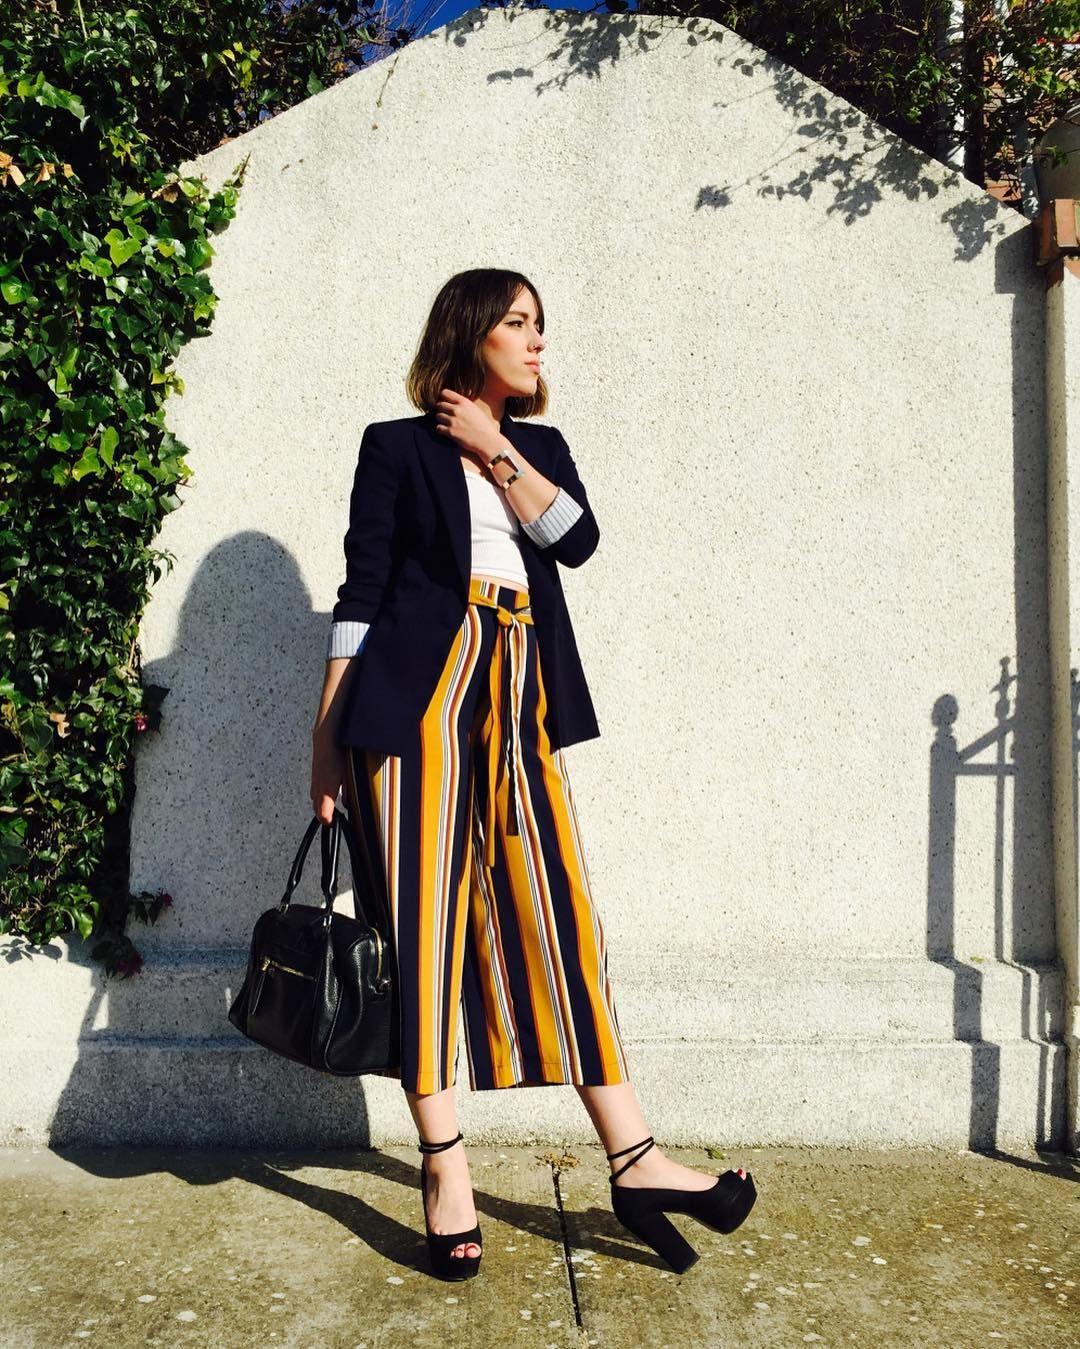 FANCY STRIPES. New post up on my blog! I hope you like tagmydressing.wordpress.com  #tag #fashionable #minimal #dressing #fashionblogger #blog #style #behappy #detail #fashionista #like #outfits #zara by tagmydressing